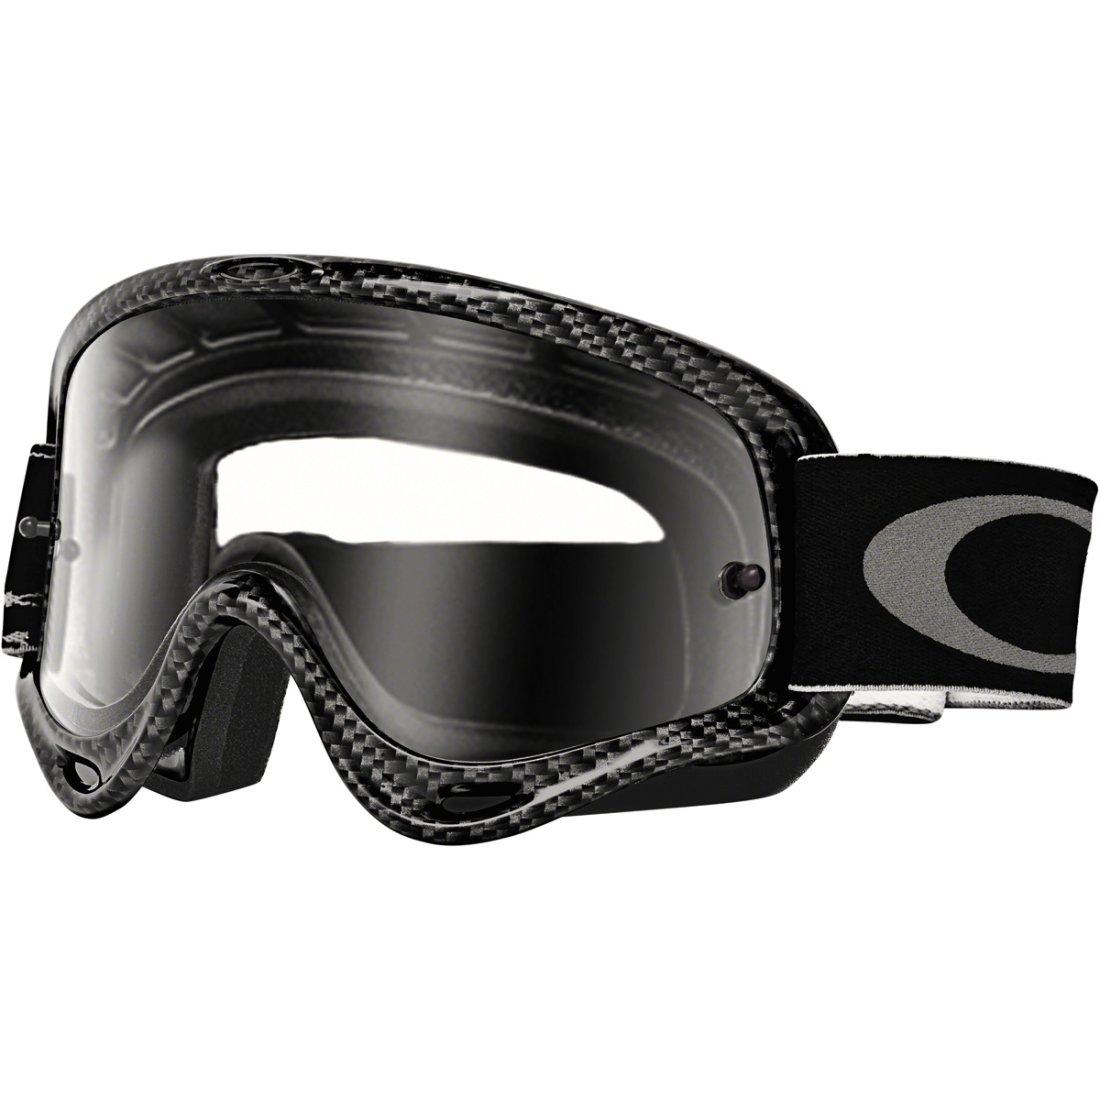 a5d3782fd2 Gafas OAKLEY MX O-Frame True Carbon Fiber Clear · Motocard